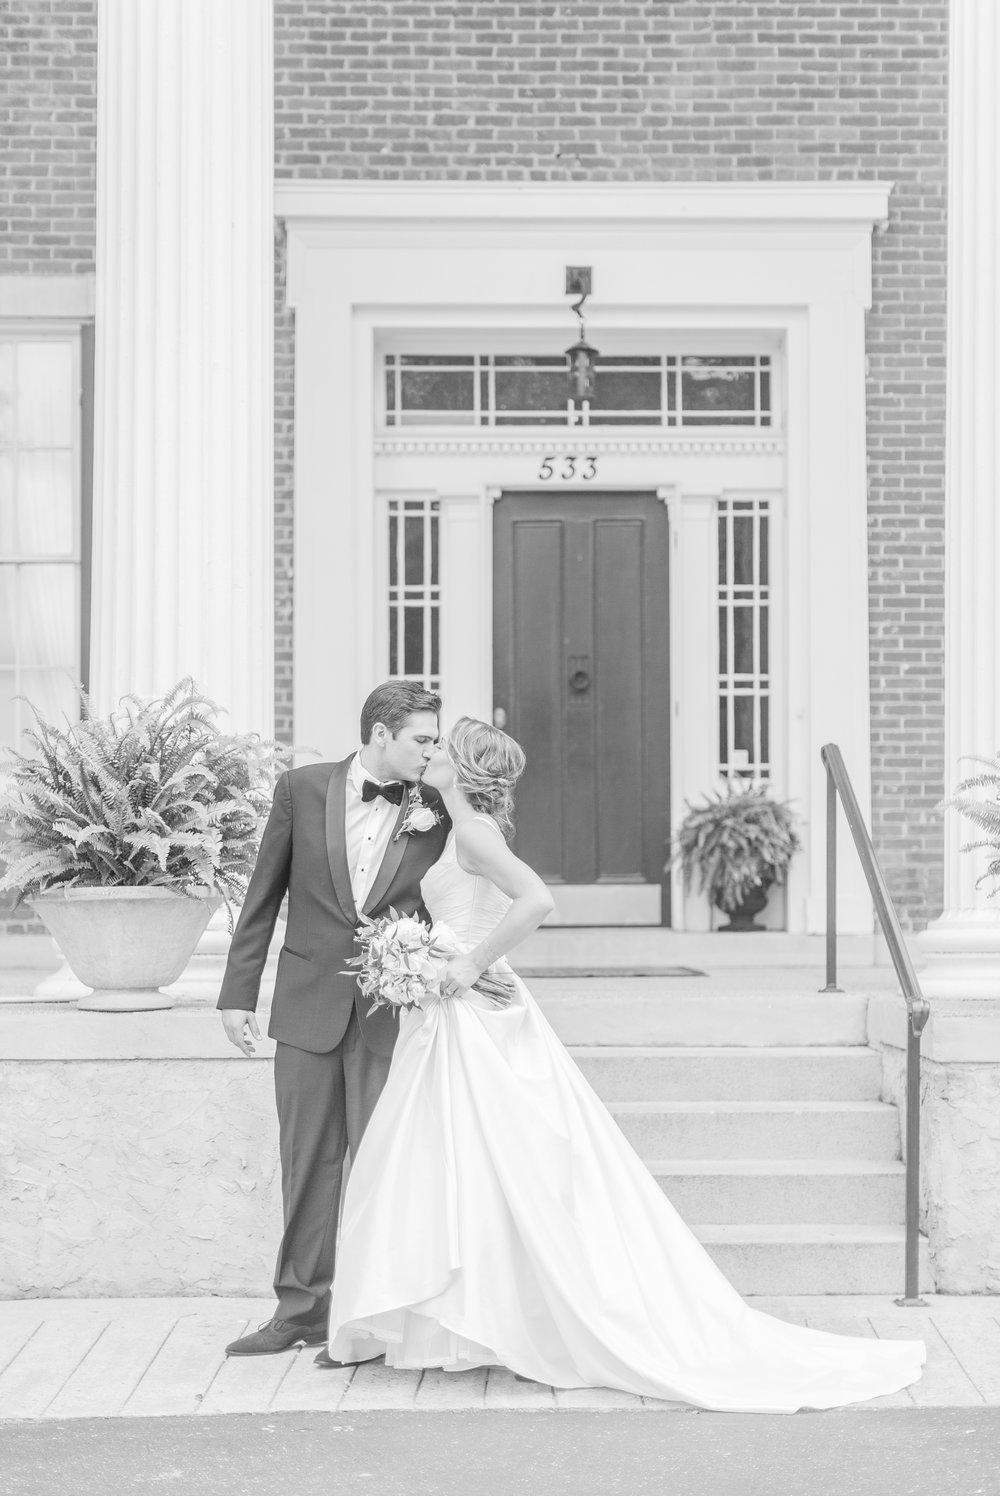 memphis-wedding-hunt-phelan 31.jpg